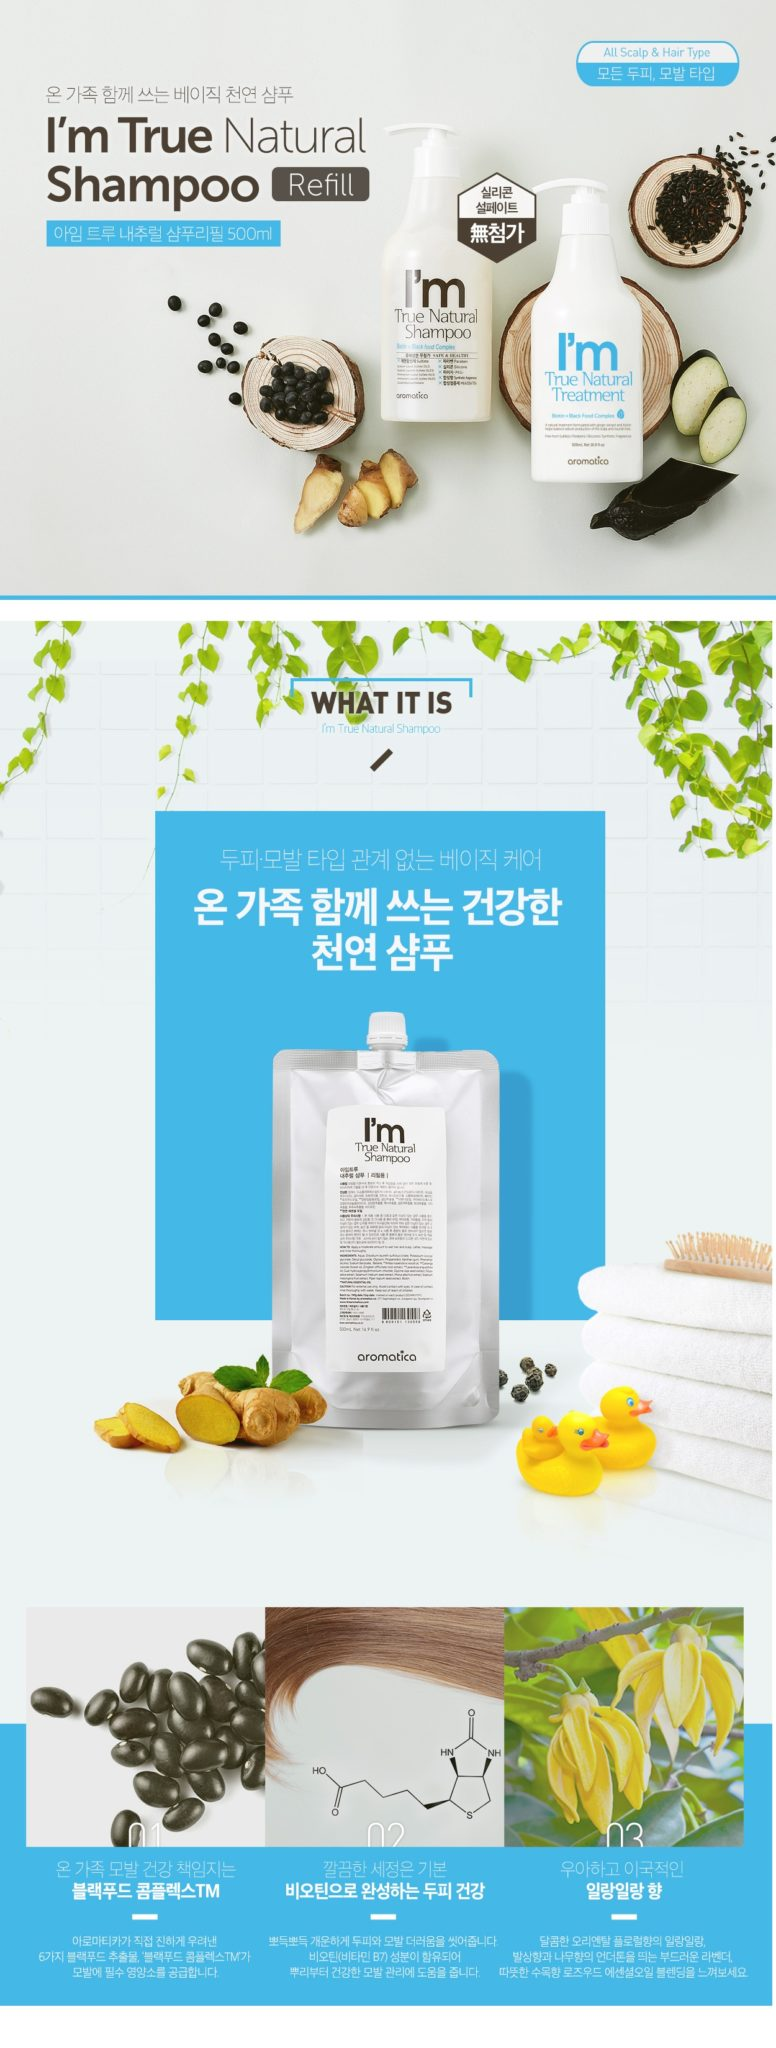 Aromatica I'm True Natural Shampoo Refill korean cosmetic bodyhair product online shop malaysia vietnam macau